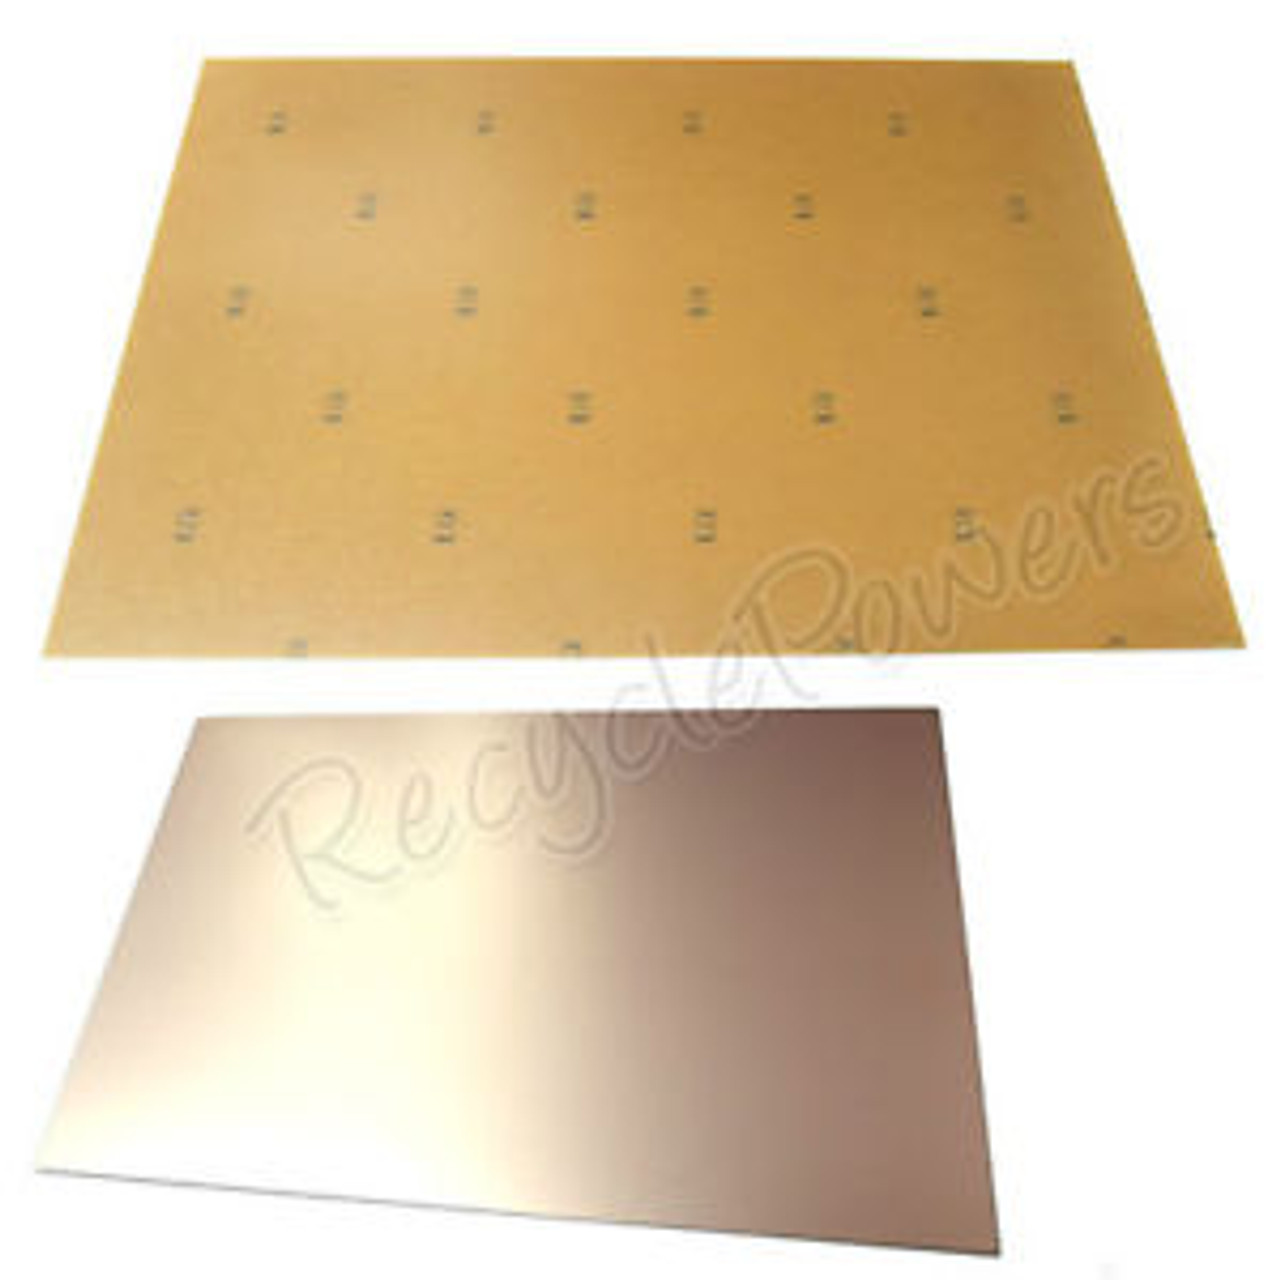 1x Copper Clad Laminate Circuit Boards FR2 PCB Single Side 12cmx18cm 120mmx180mm